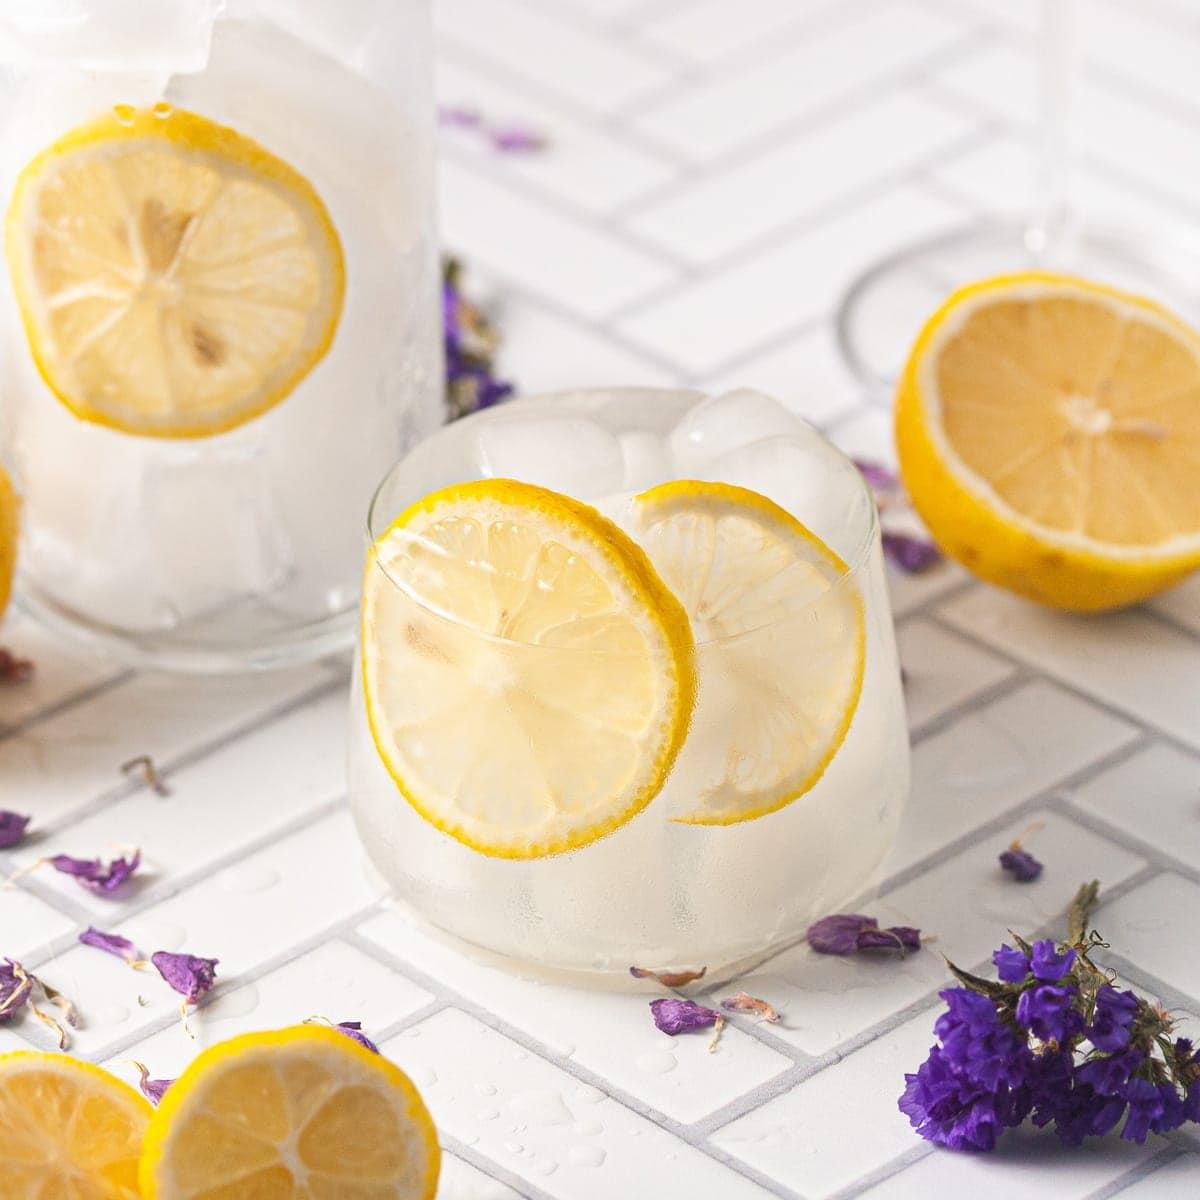 3 lemon sours